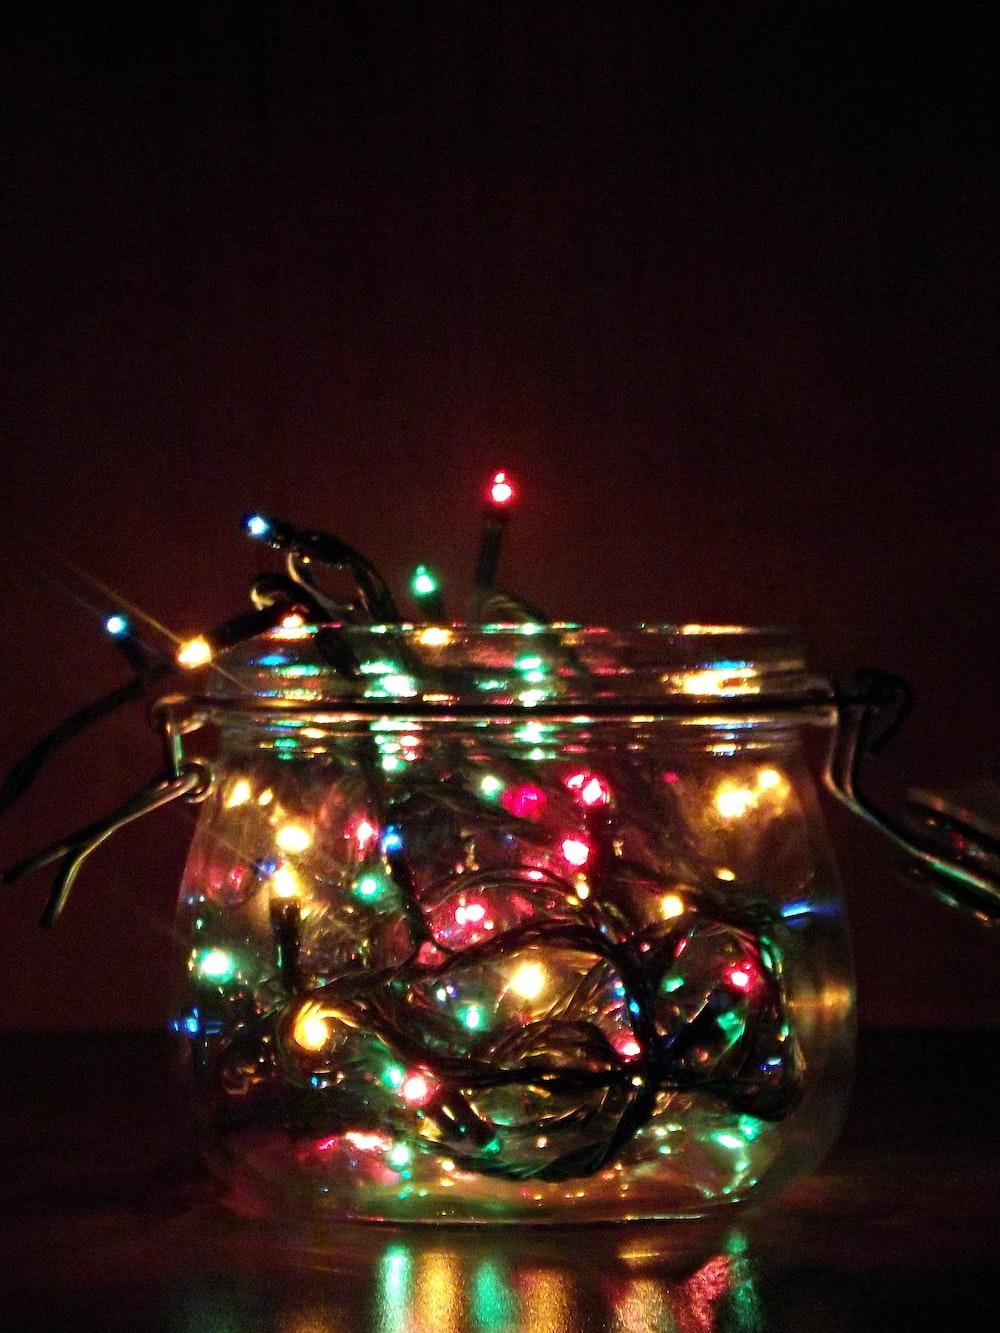 A glass jar containing Christmas tree lights.